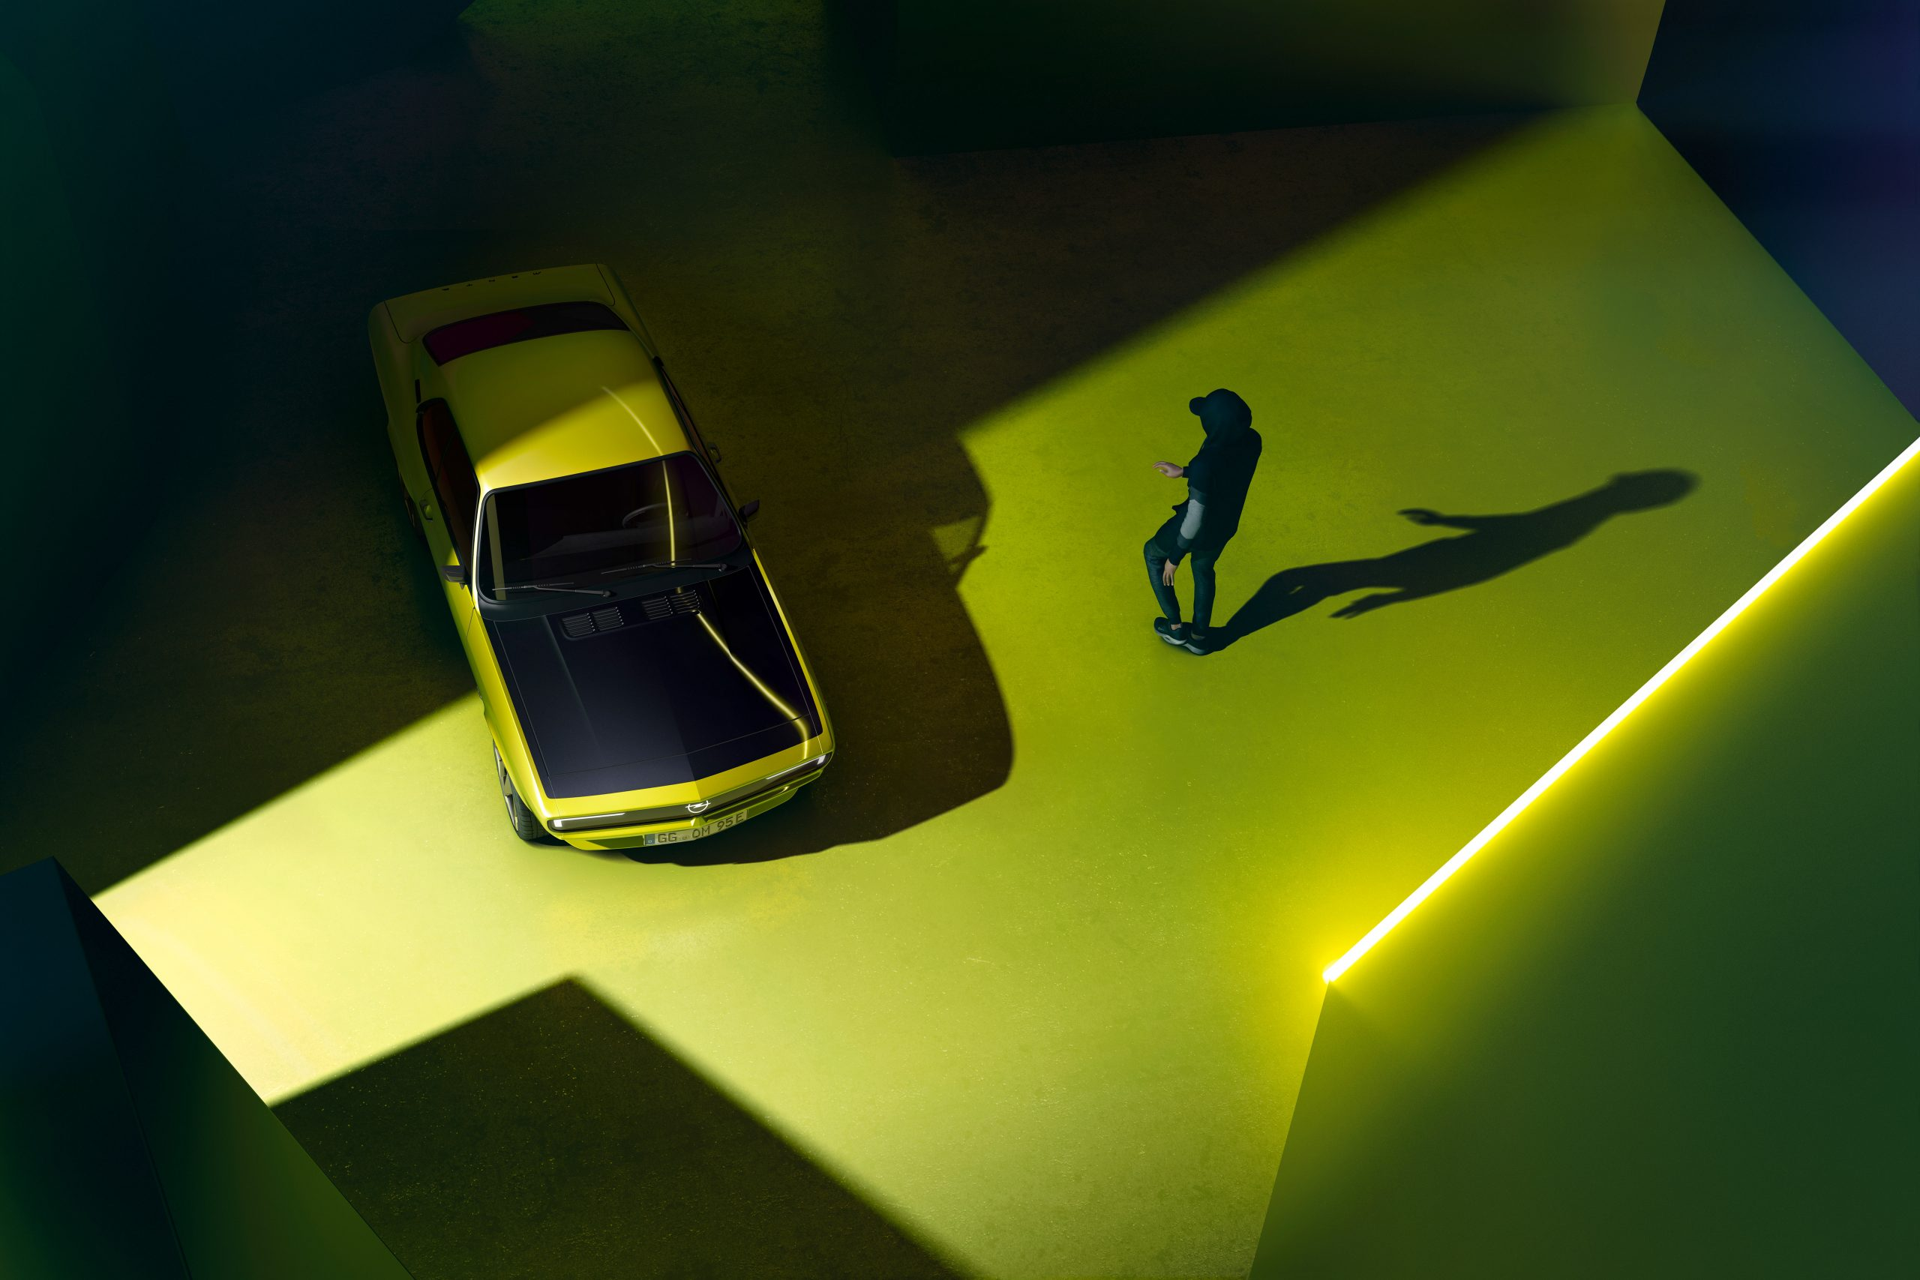 Opel Manta GSe ElektroMOD - retro pod napięciem